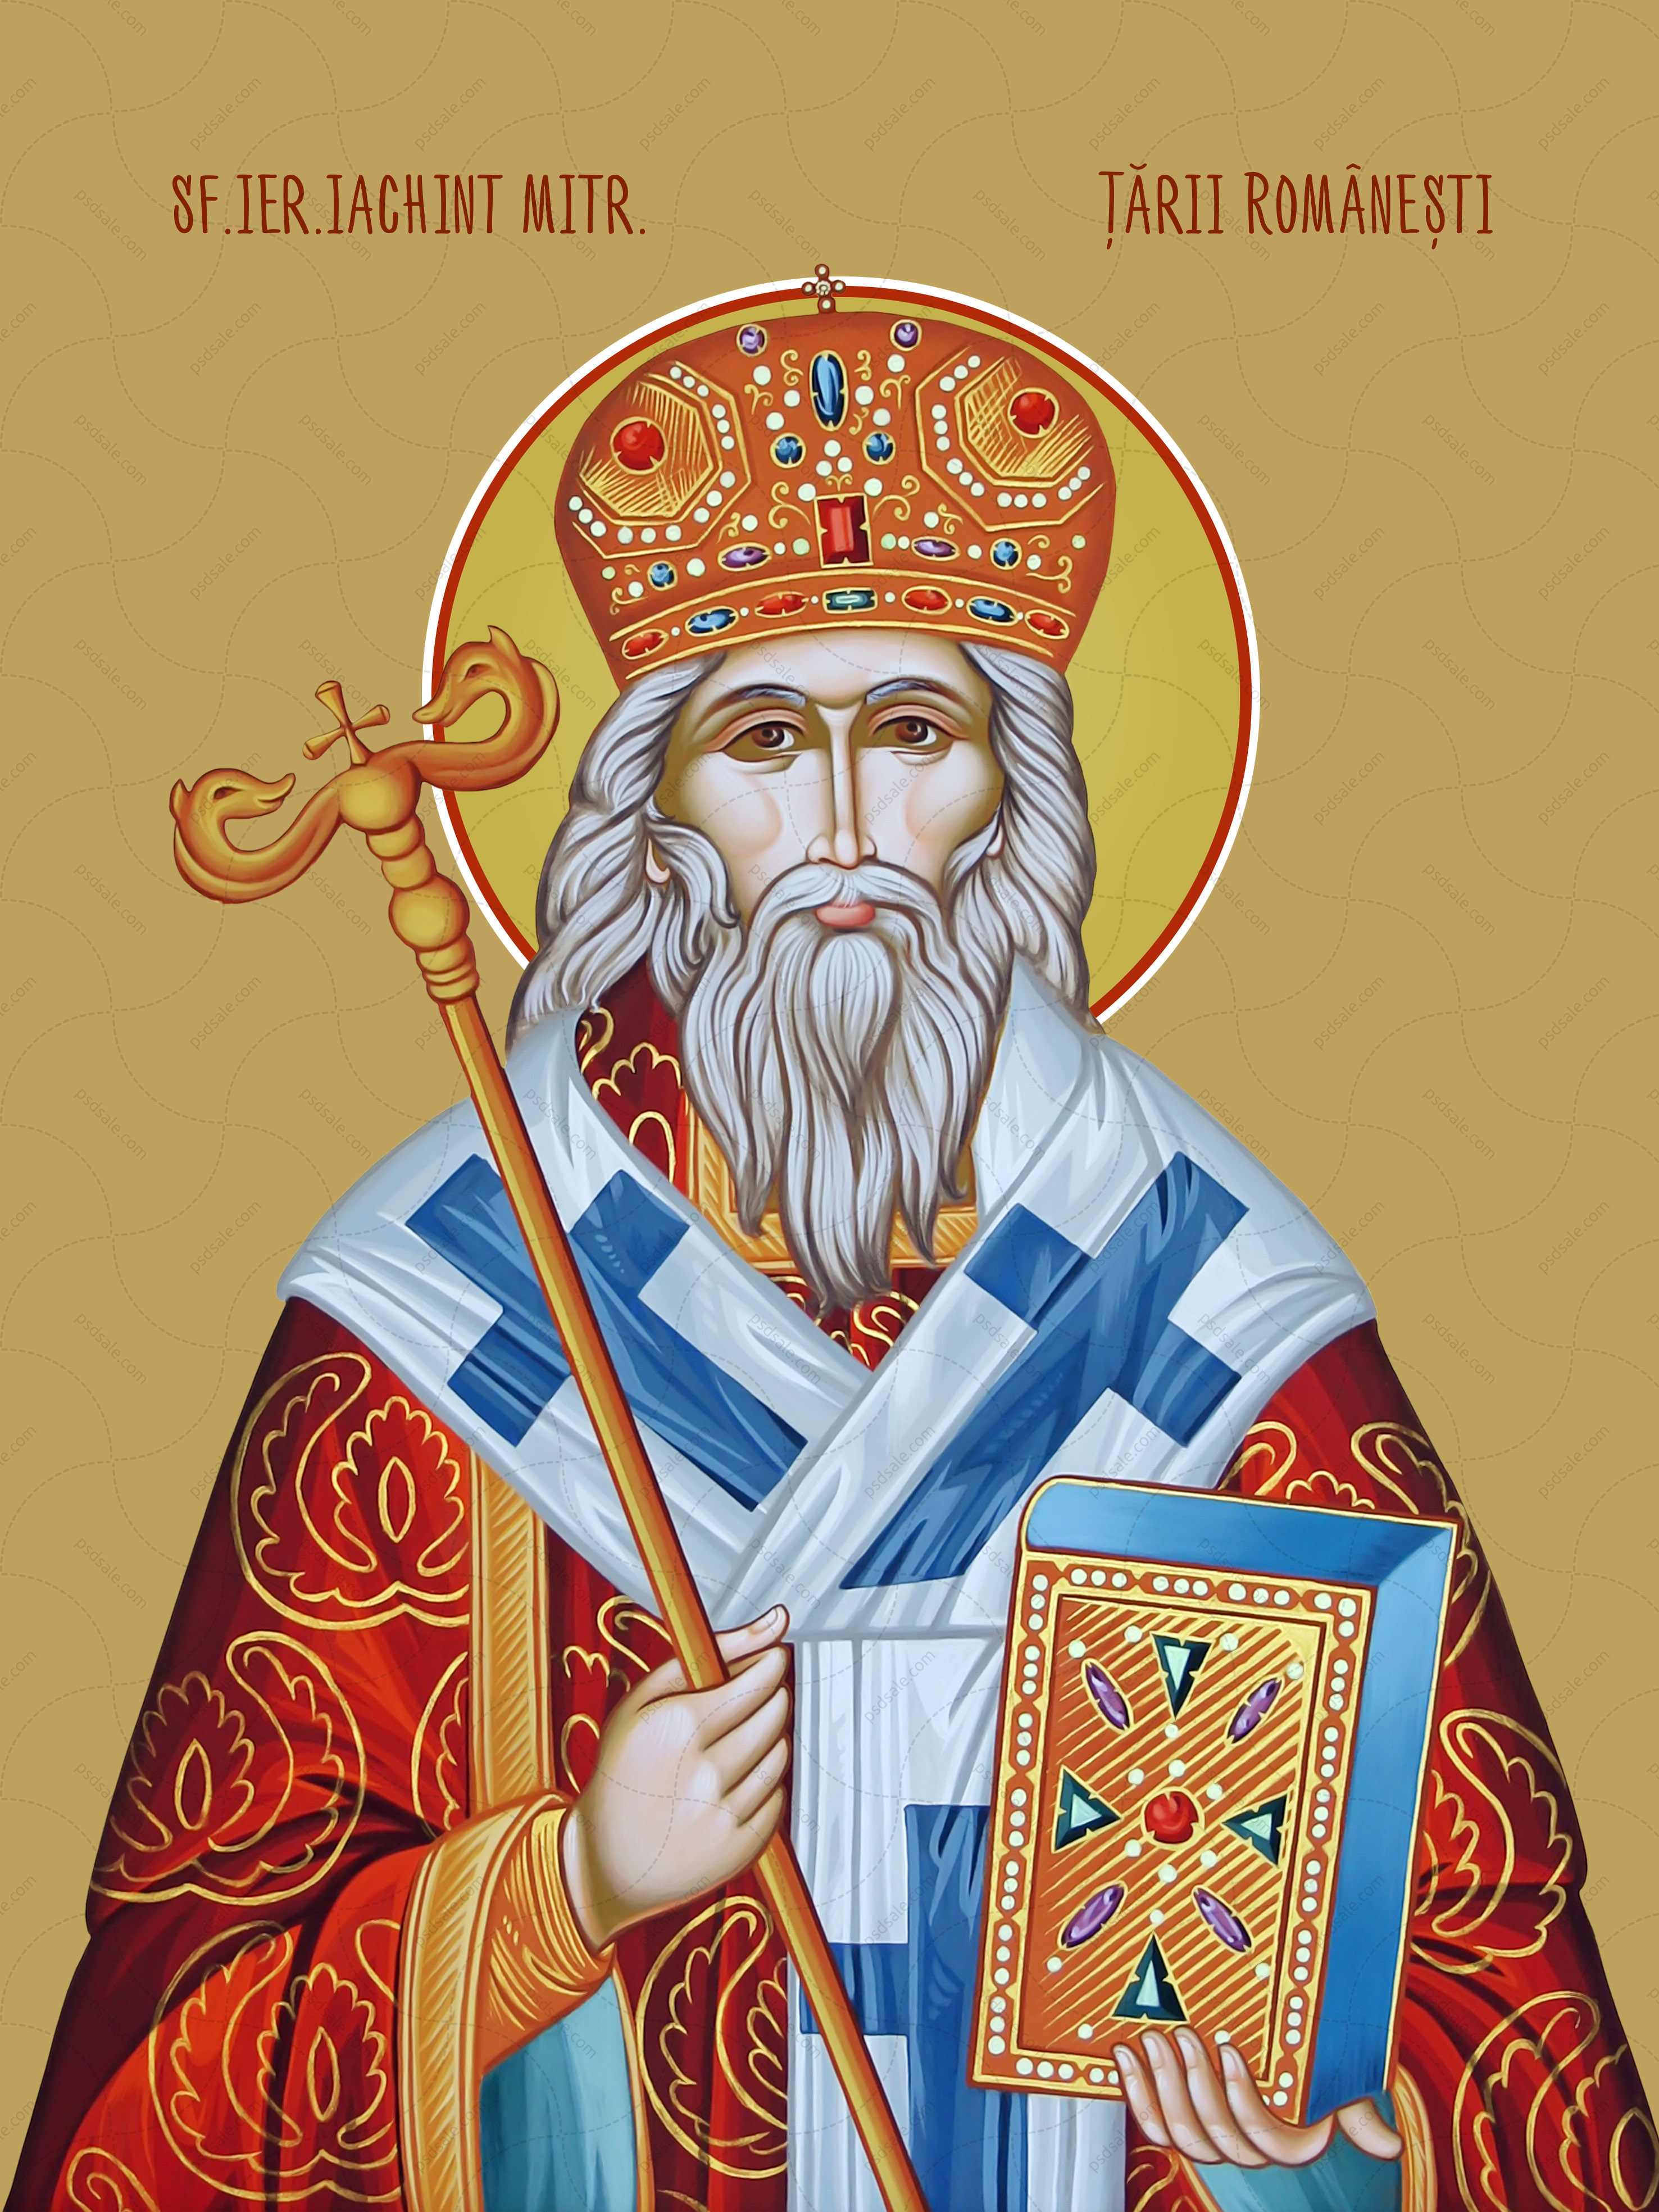 Яхинт, святой / Sf Iachint, Mitropolitul Ţării Româneşti